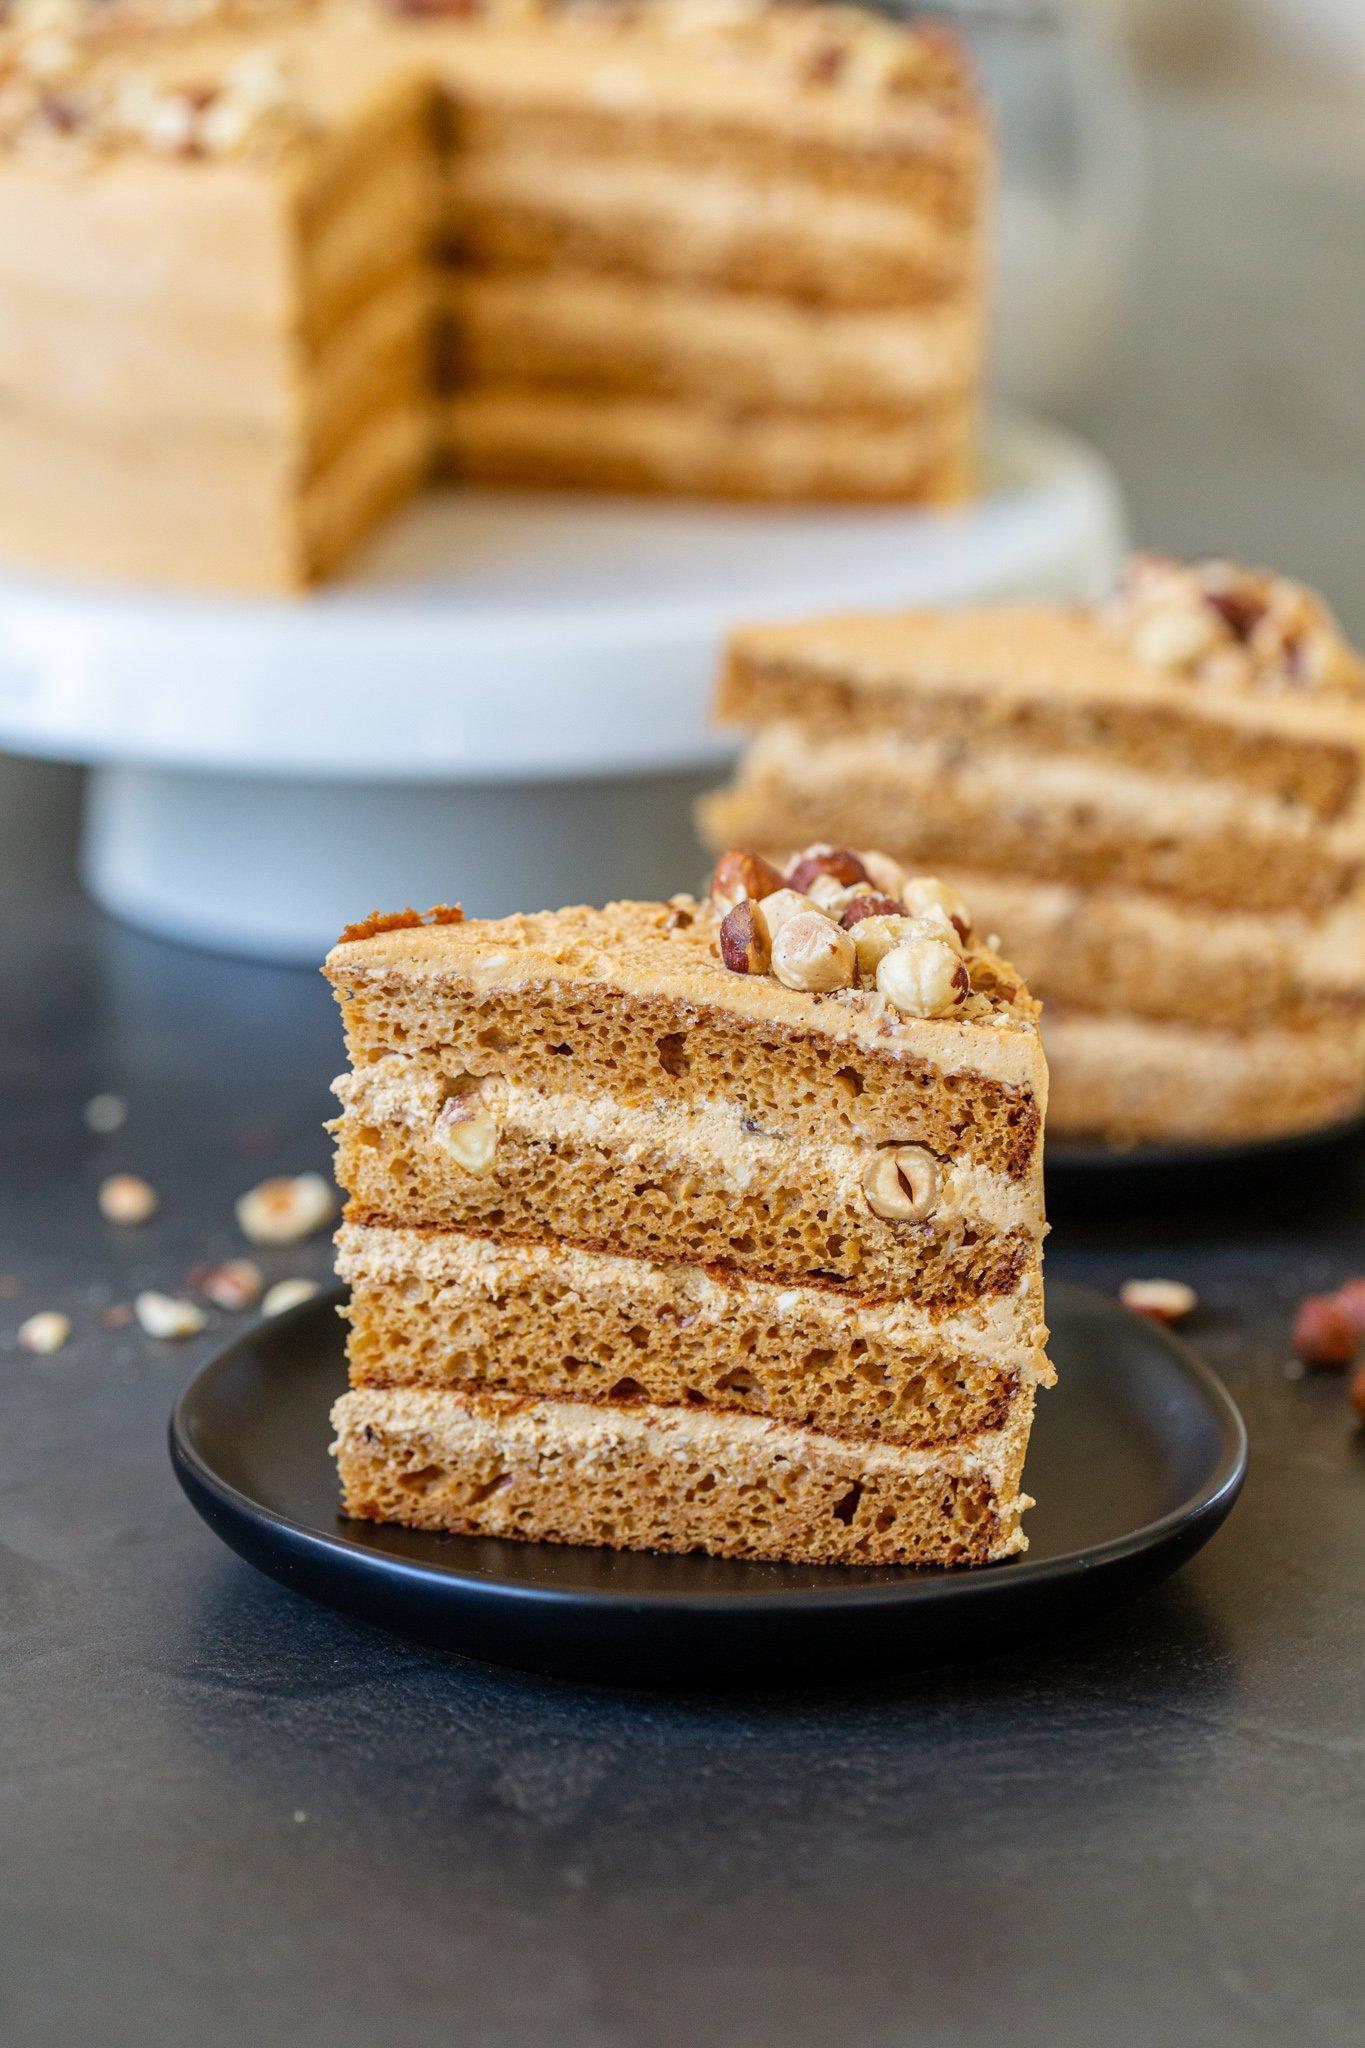 A slice of dulce de leche cake